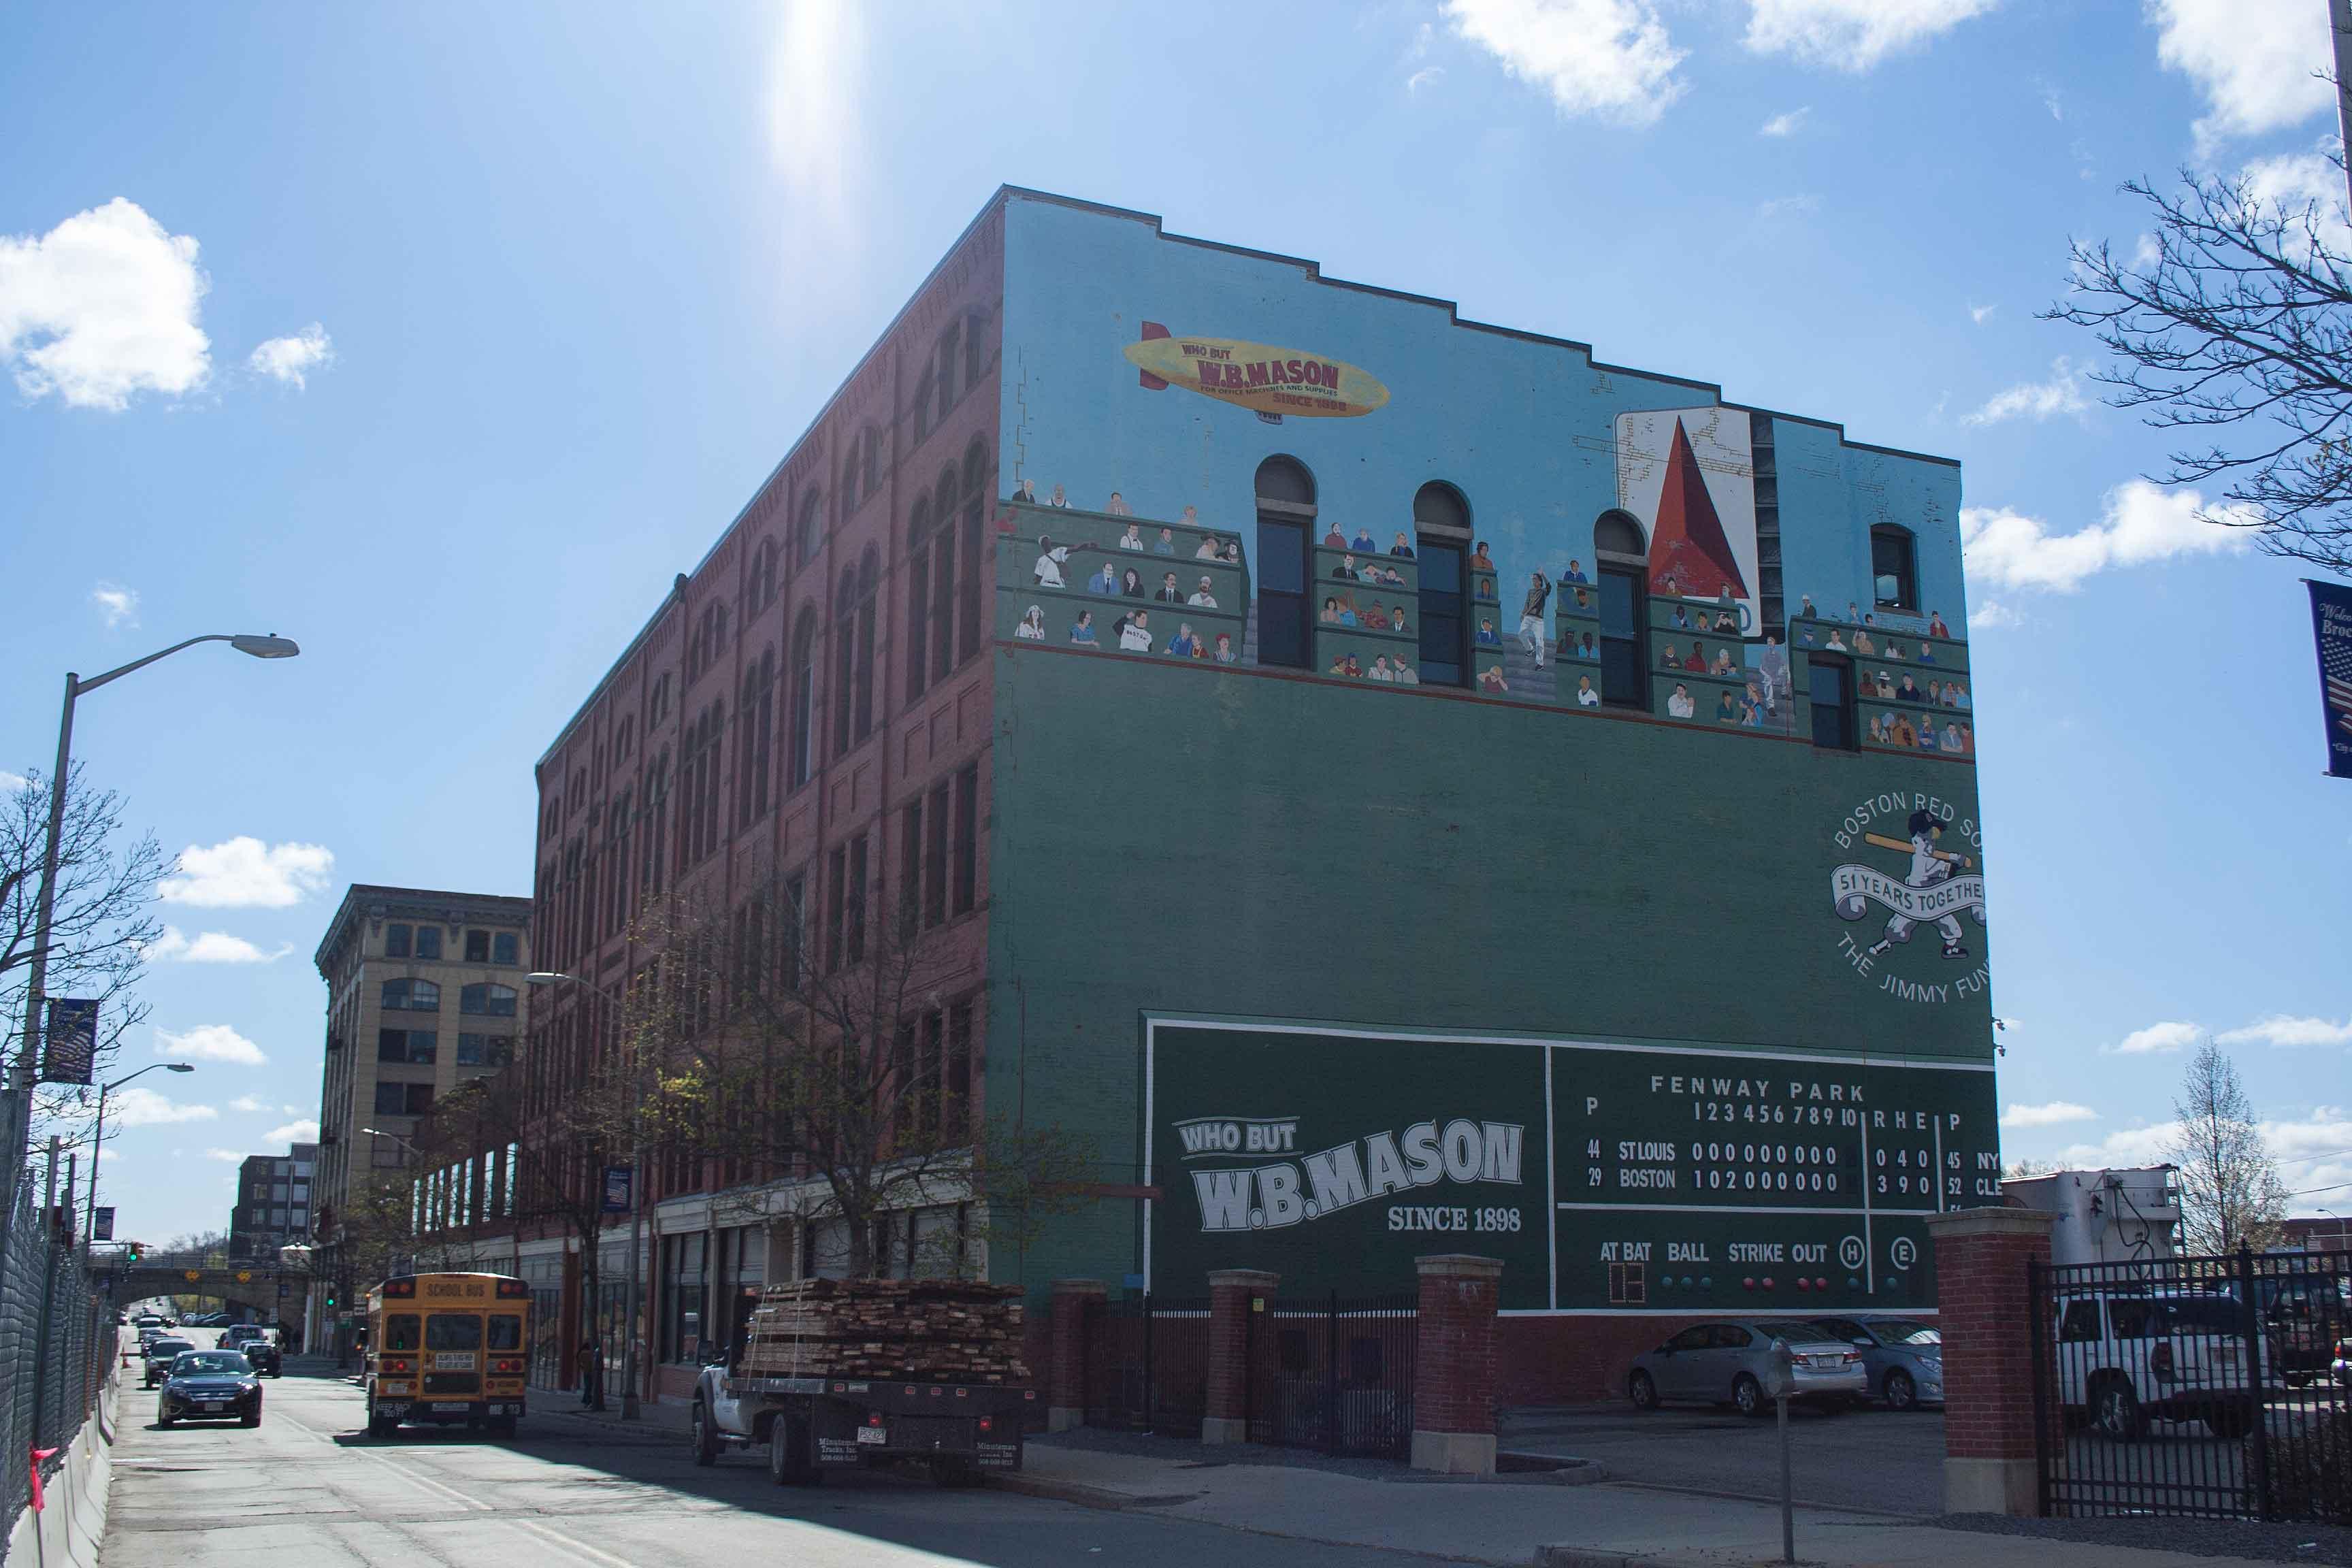 Longleaf Lumber  WB Mason Headquarters